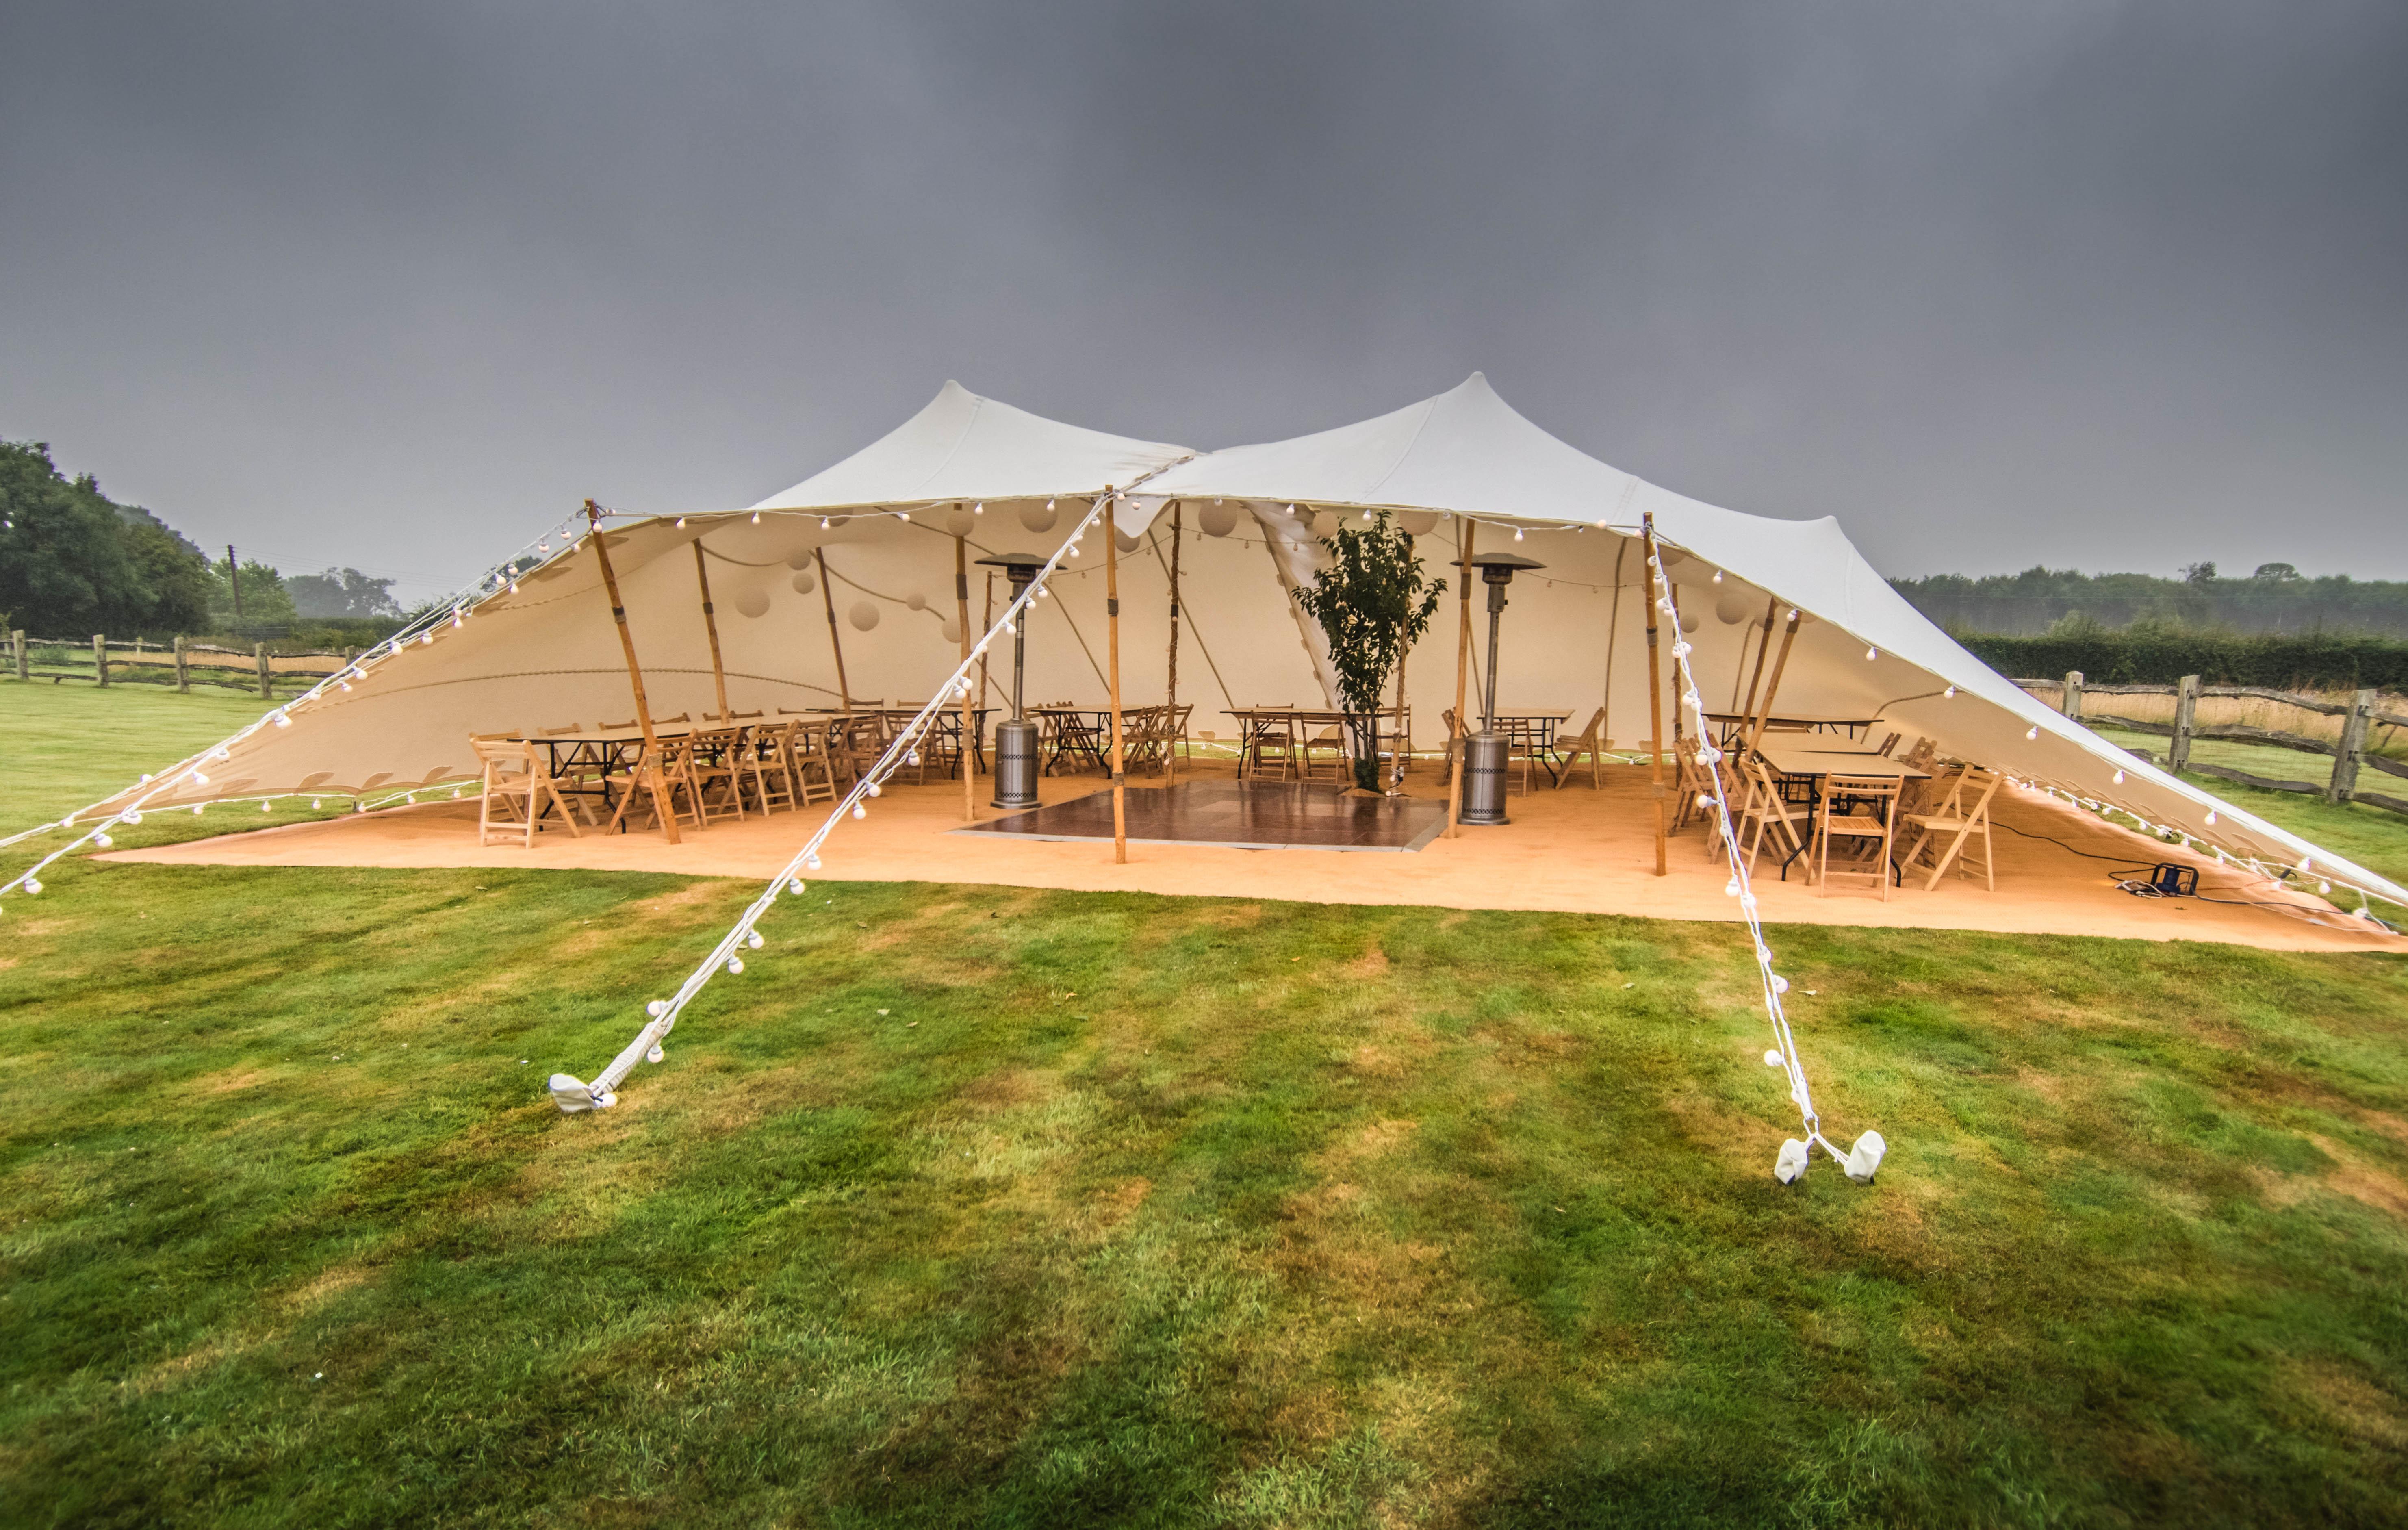 4Elements Tents - 2 x 10x7.5